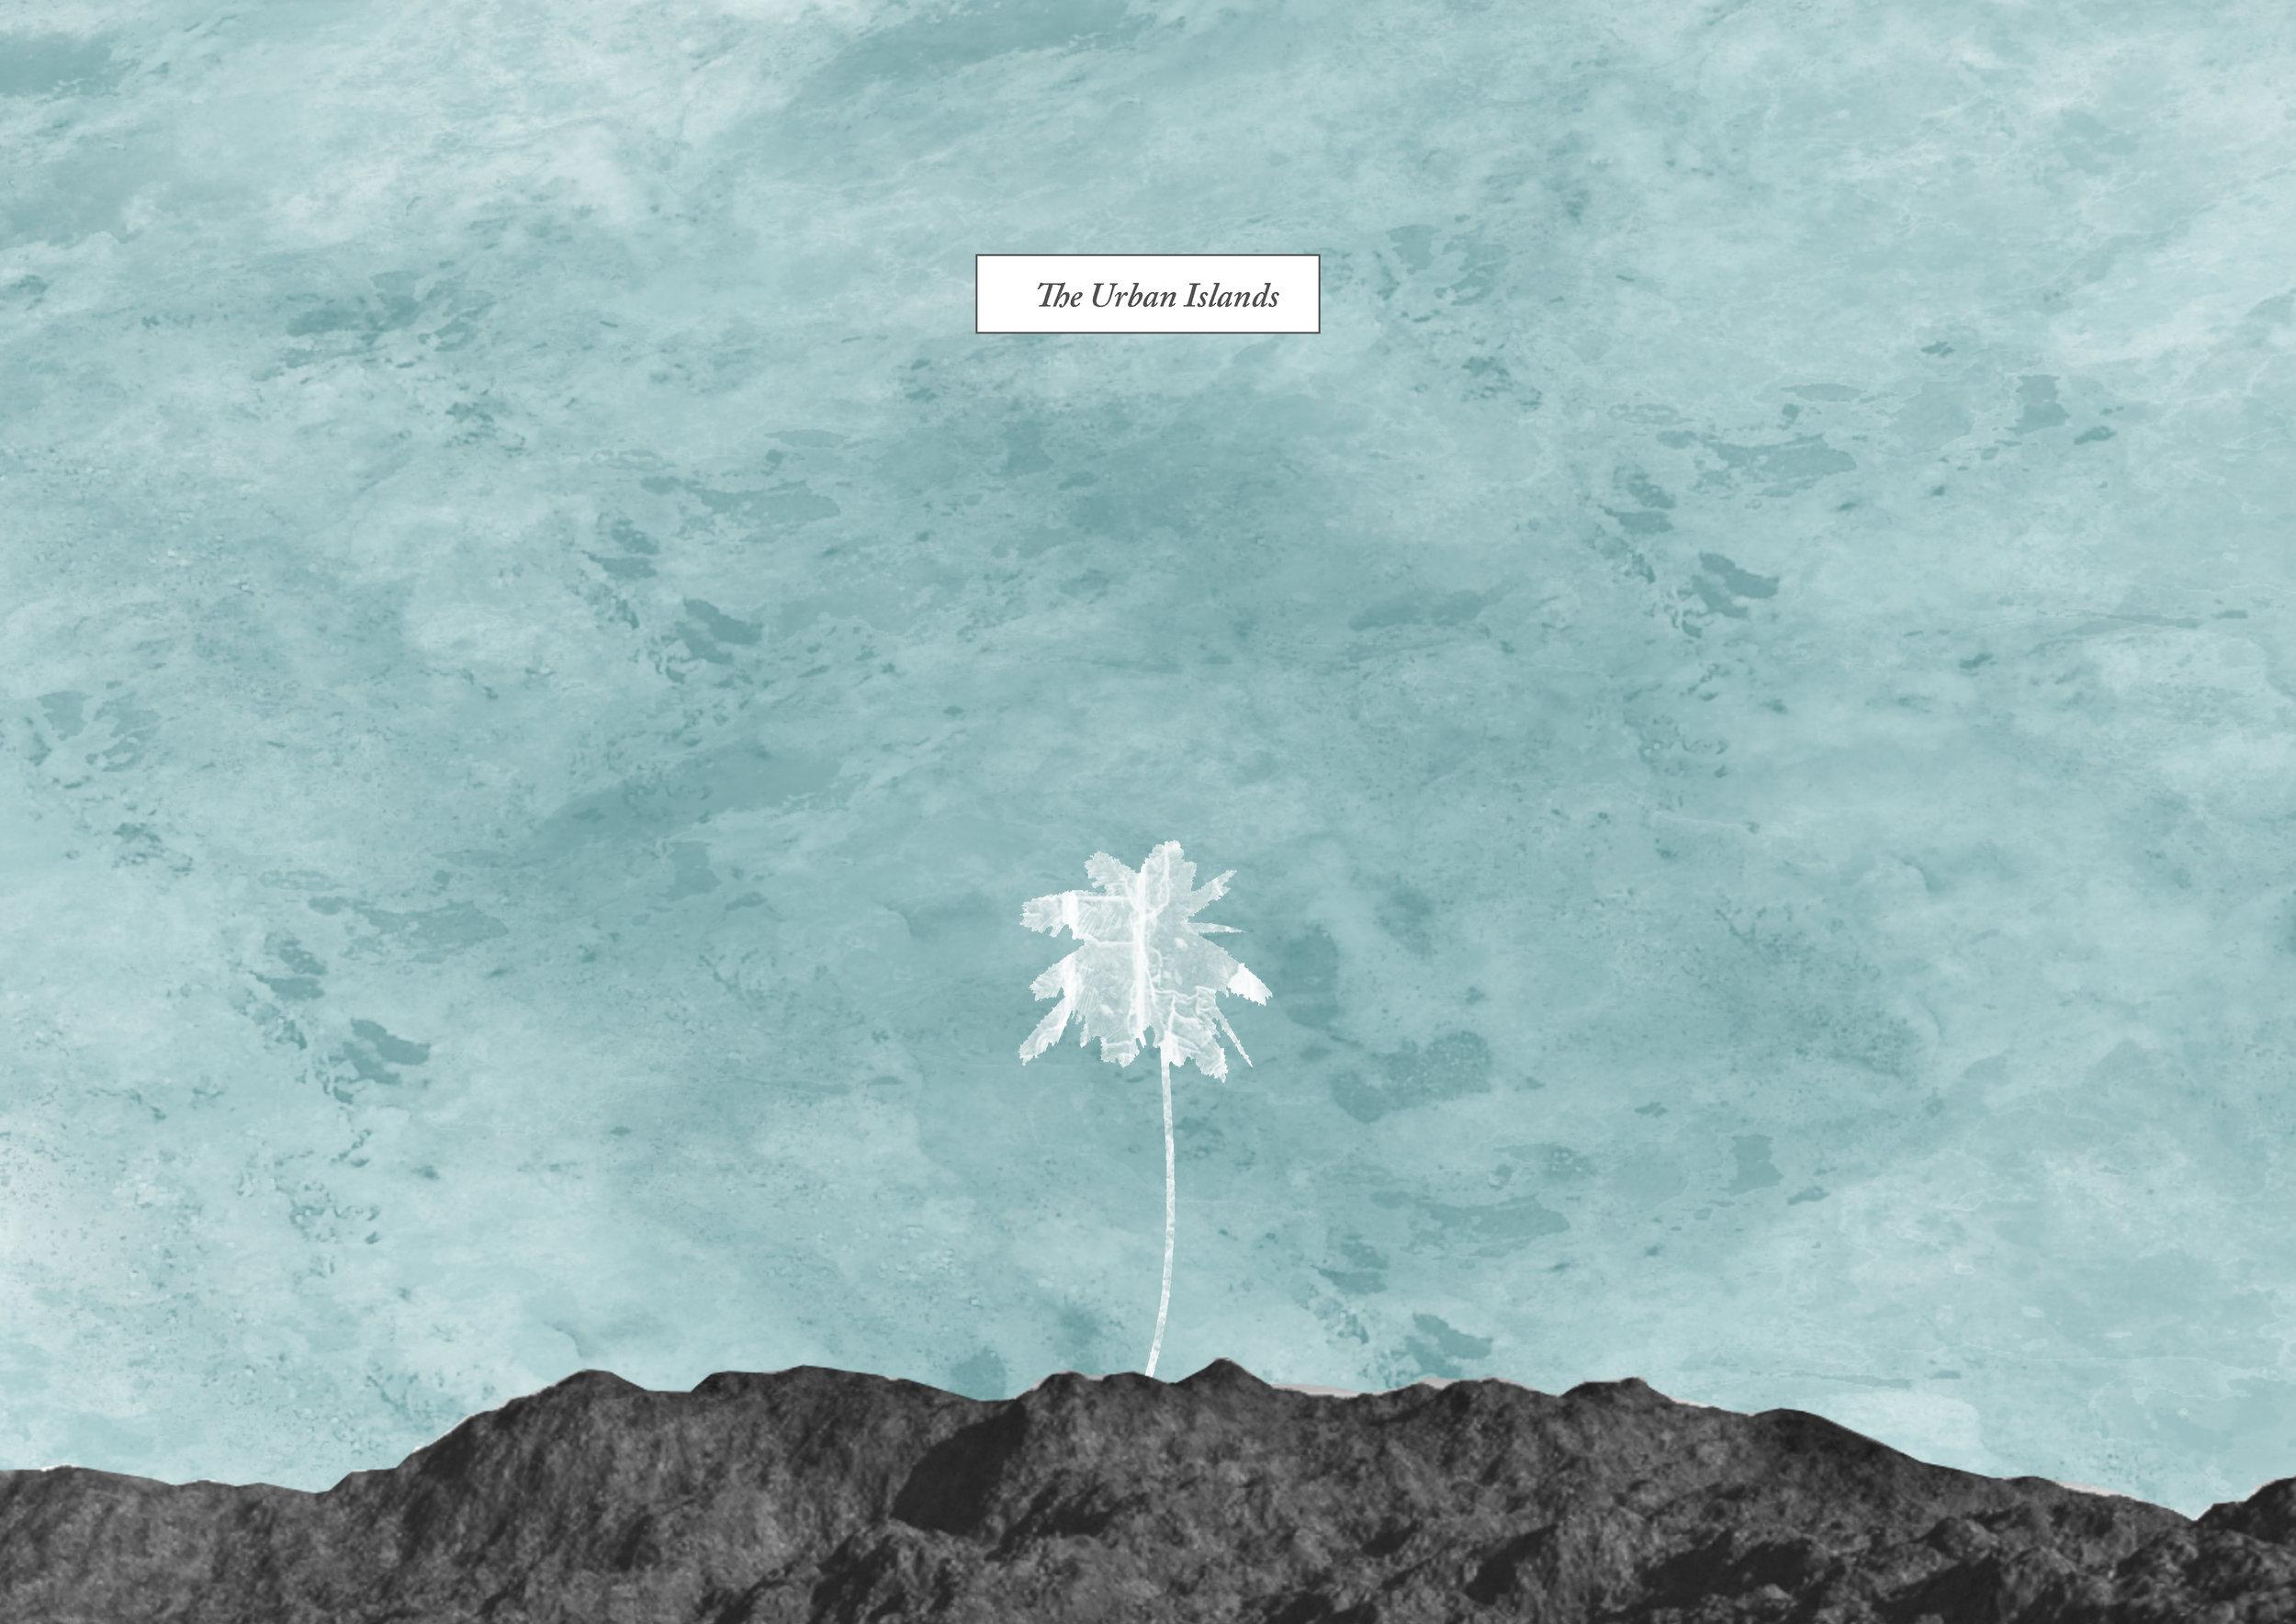 01_THE URBAN ISLANDS.jpg